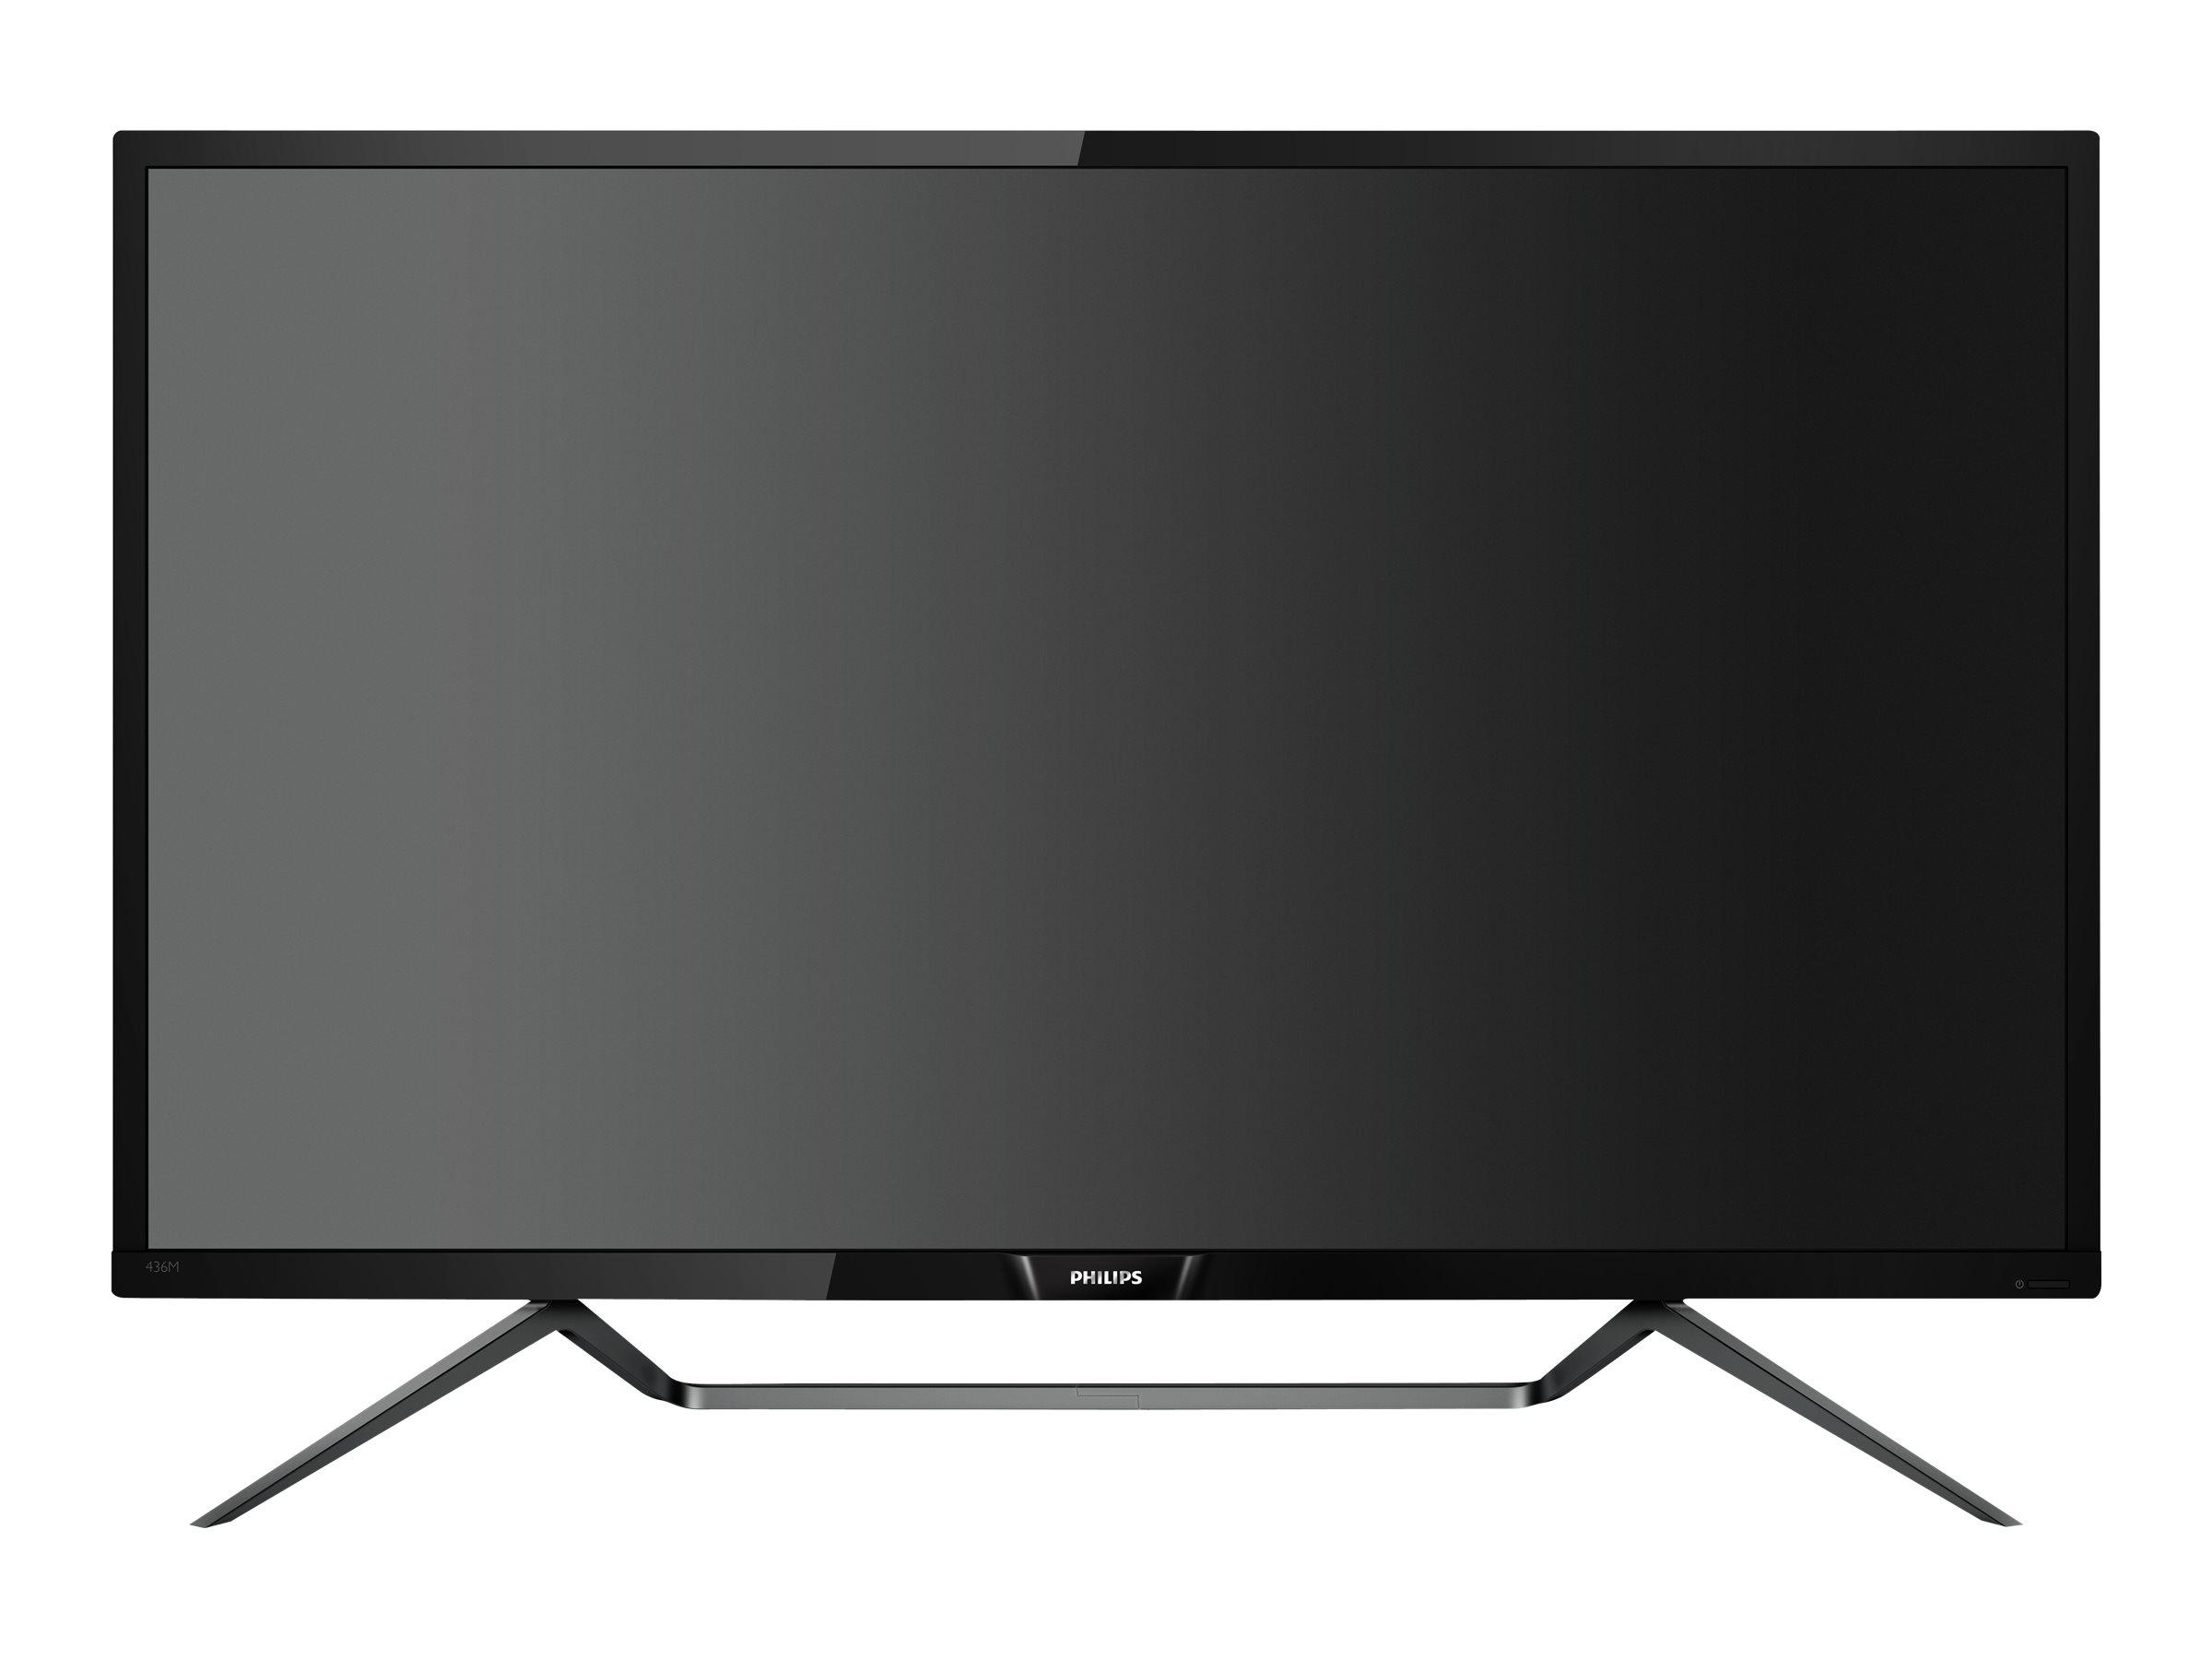 Philips Momentum 436M6VBPAB - LED-Monitor - 109.2 cm (43